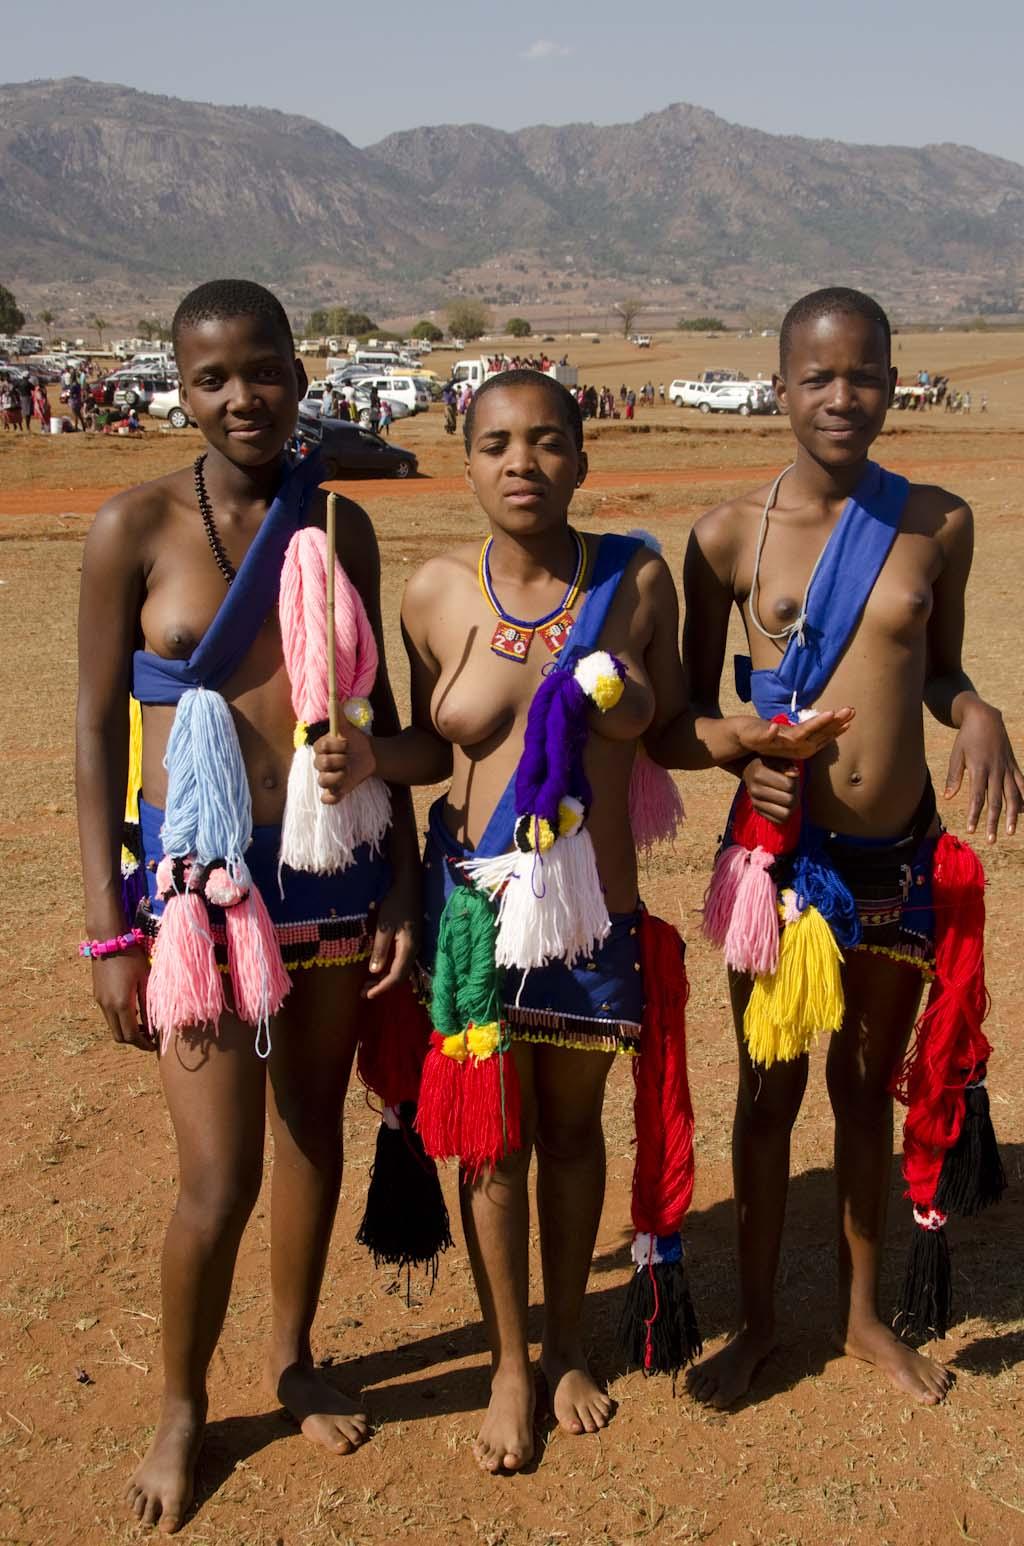 Zulu reed dance girls